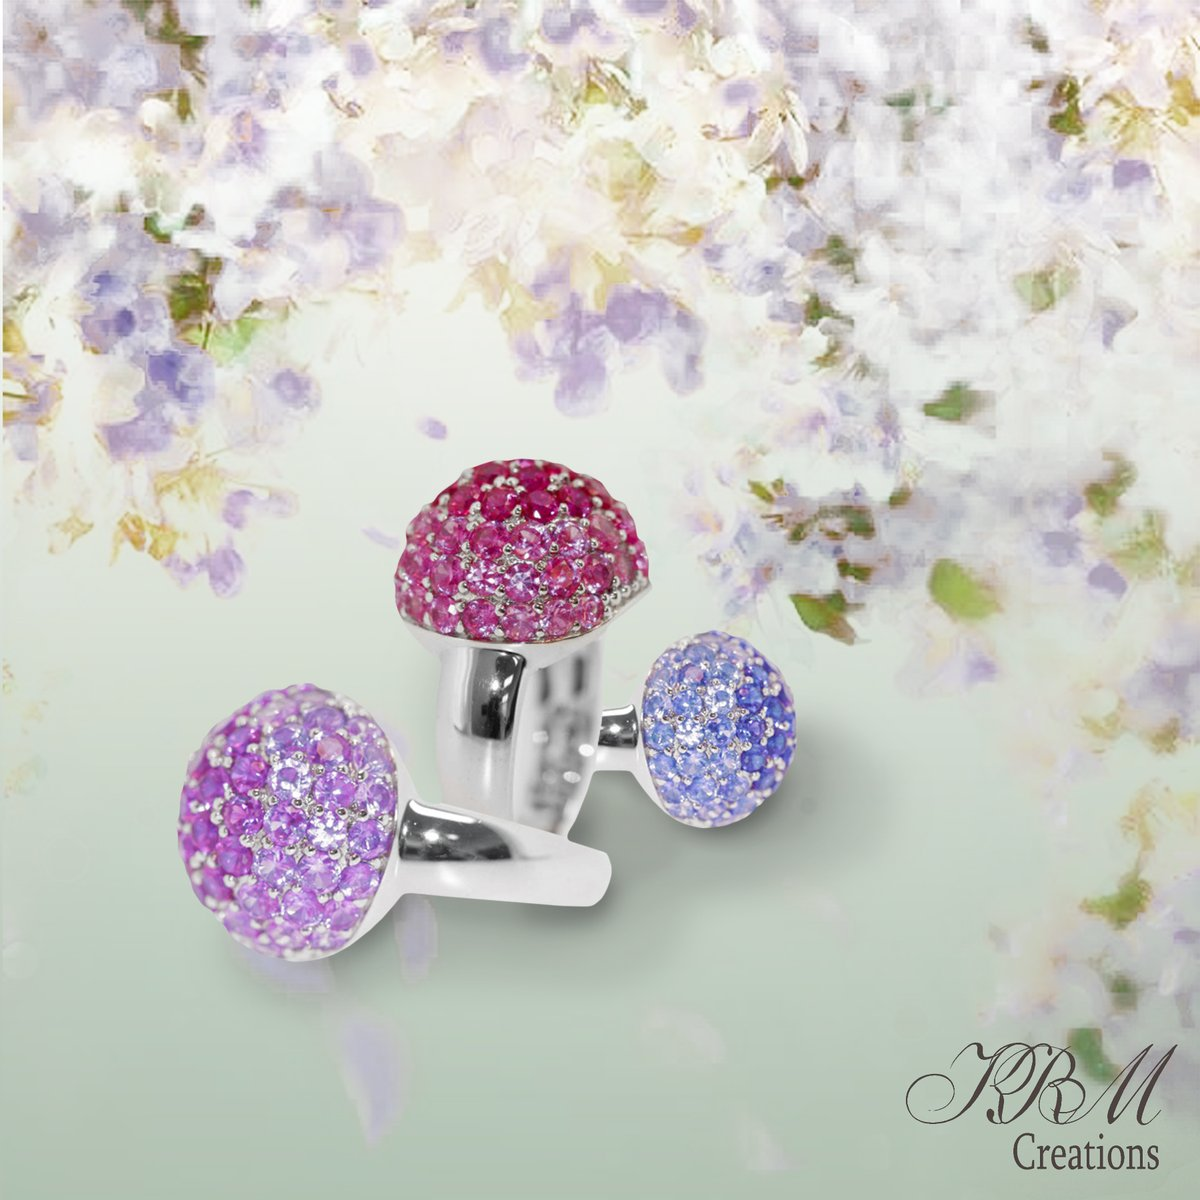 #corandum #ring #pink #pinkcorandum #amethyst #bluesapphire #purple #highjewelry #ijo #clusterring #facet #gold #jewelry #jewels #highjewelart